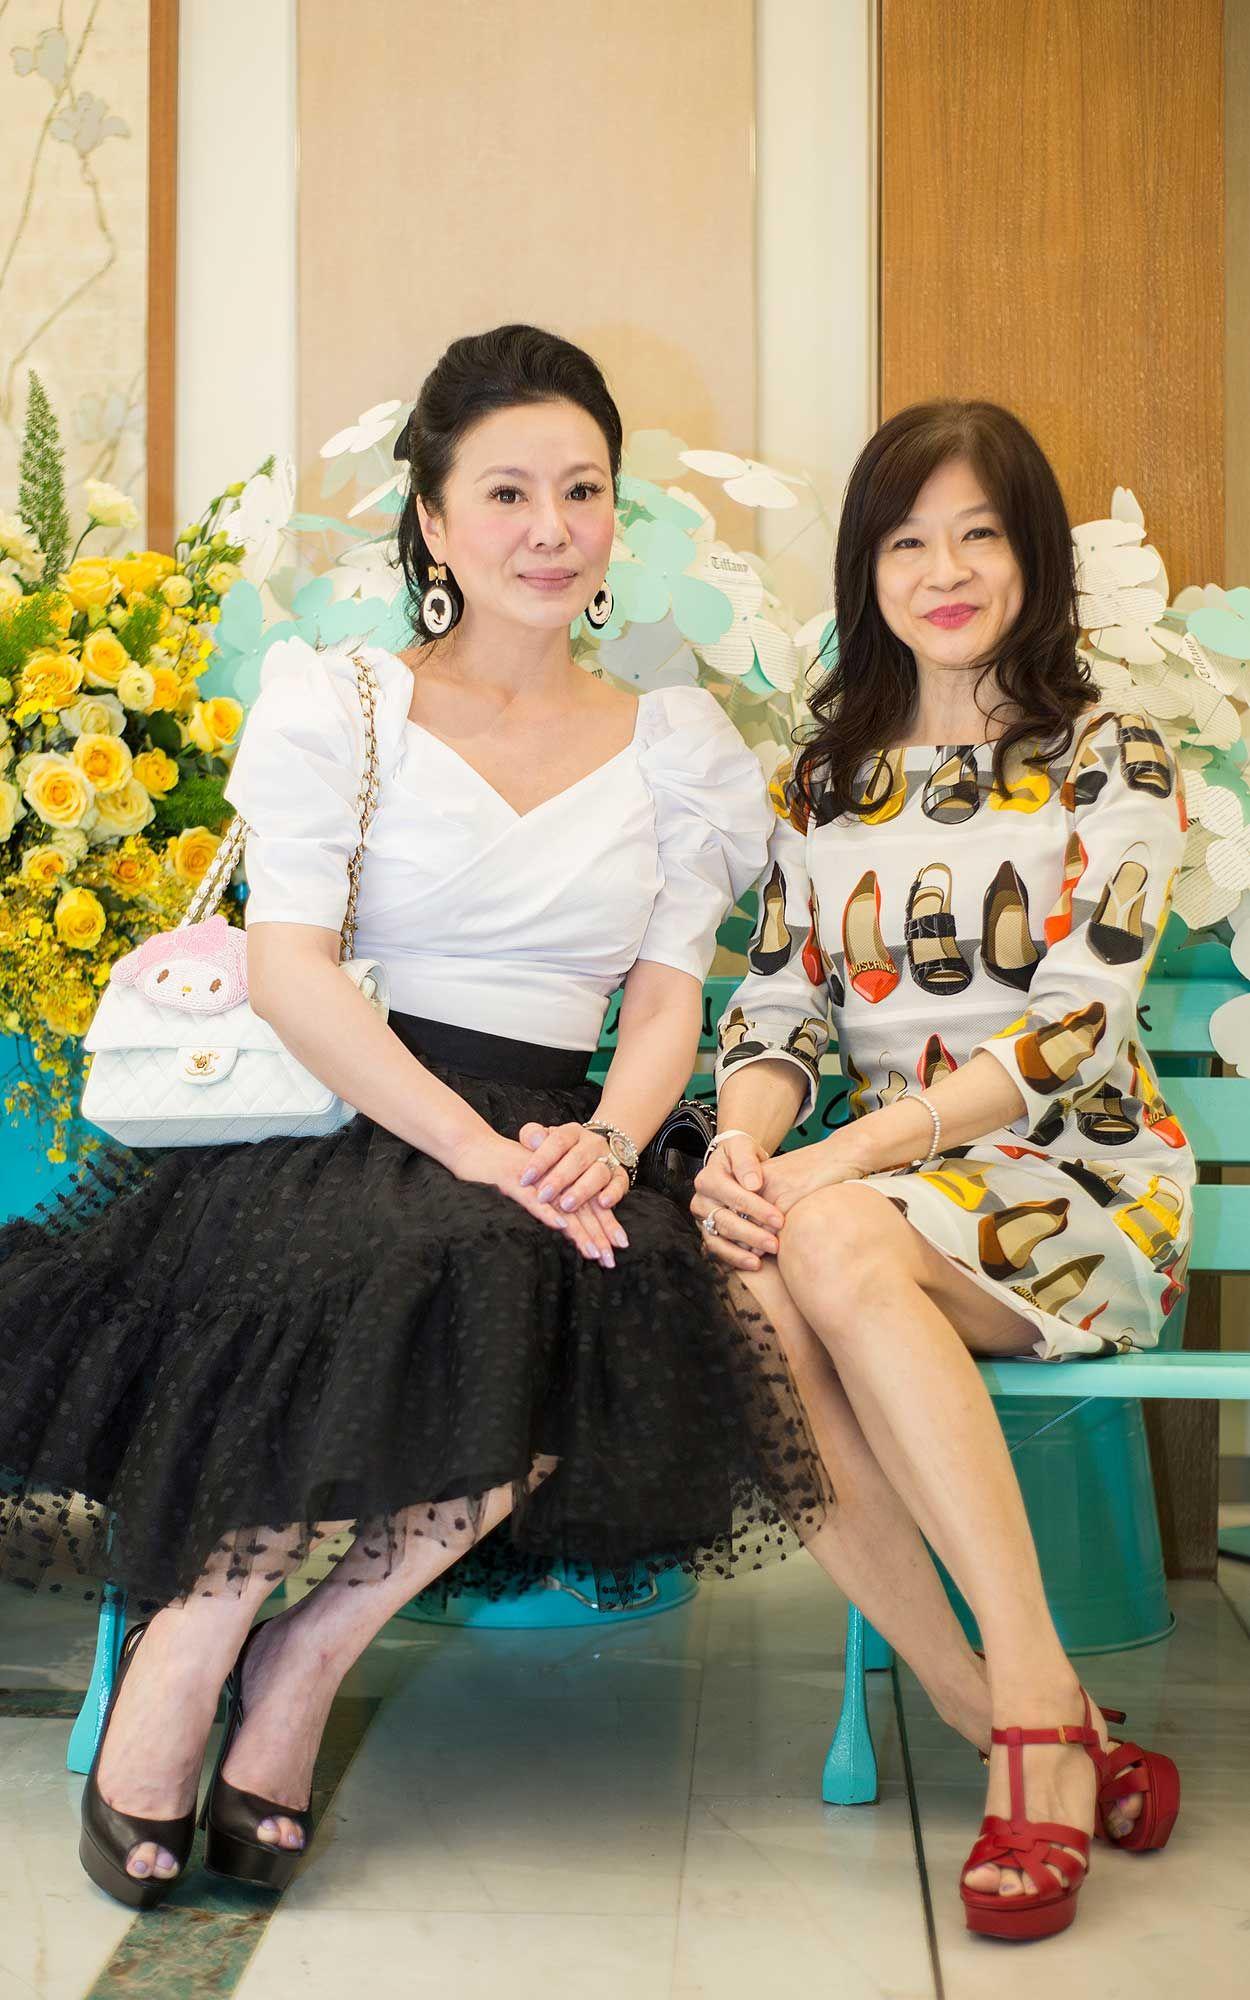 Dato' Joneser Choi and Faridah Teh